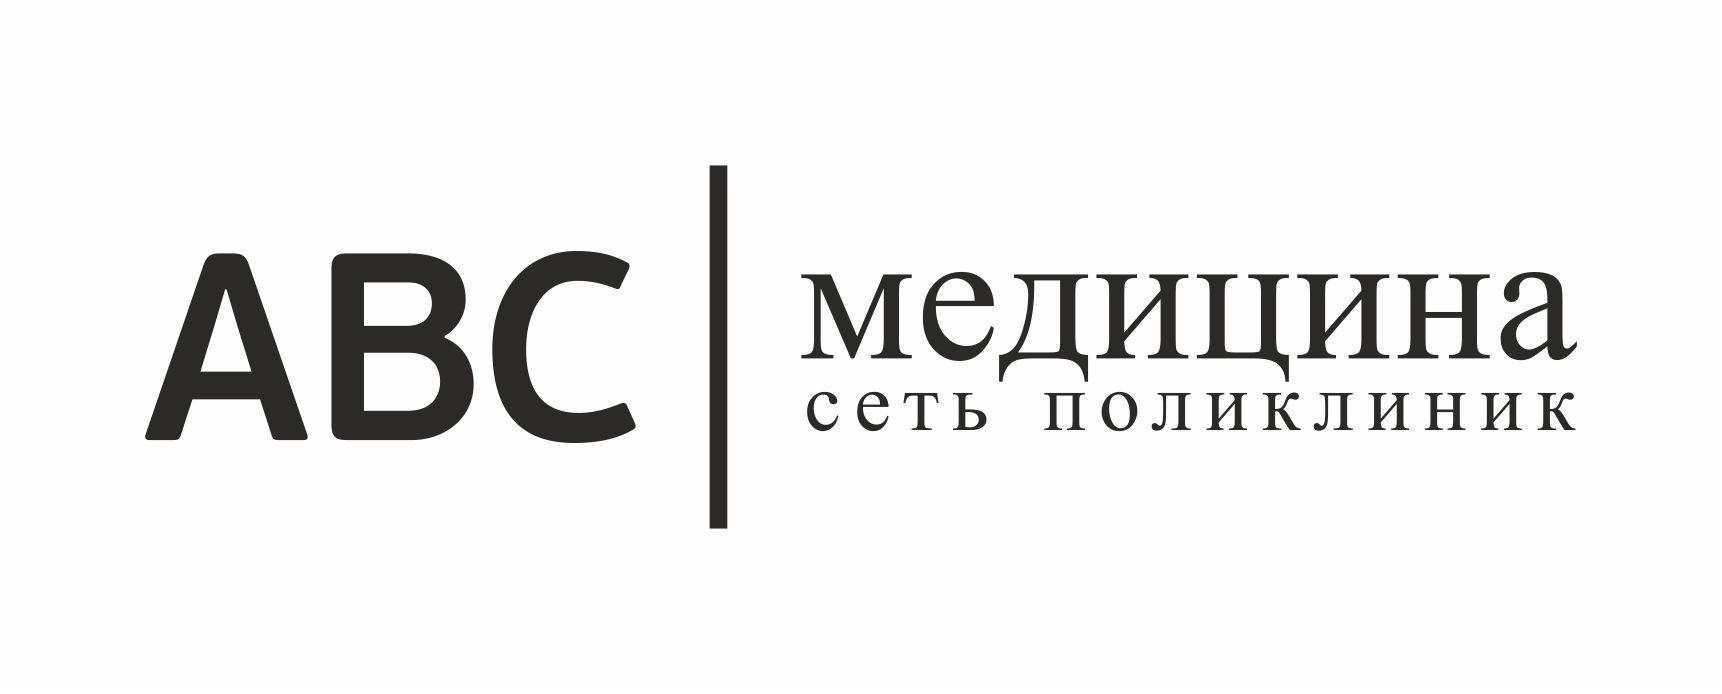 Поликлиника «ABC медицина» у м. Парк Культуры